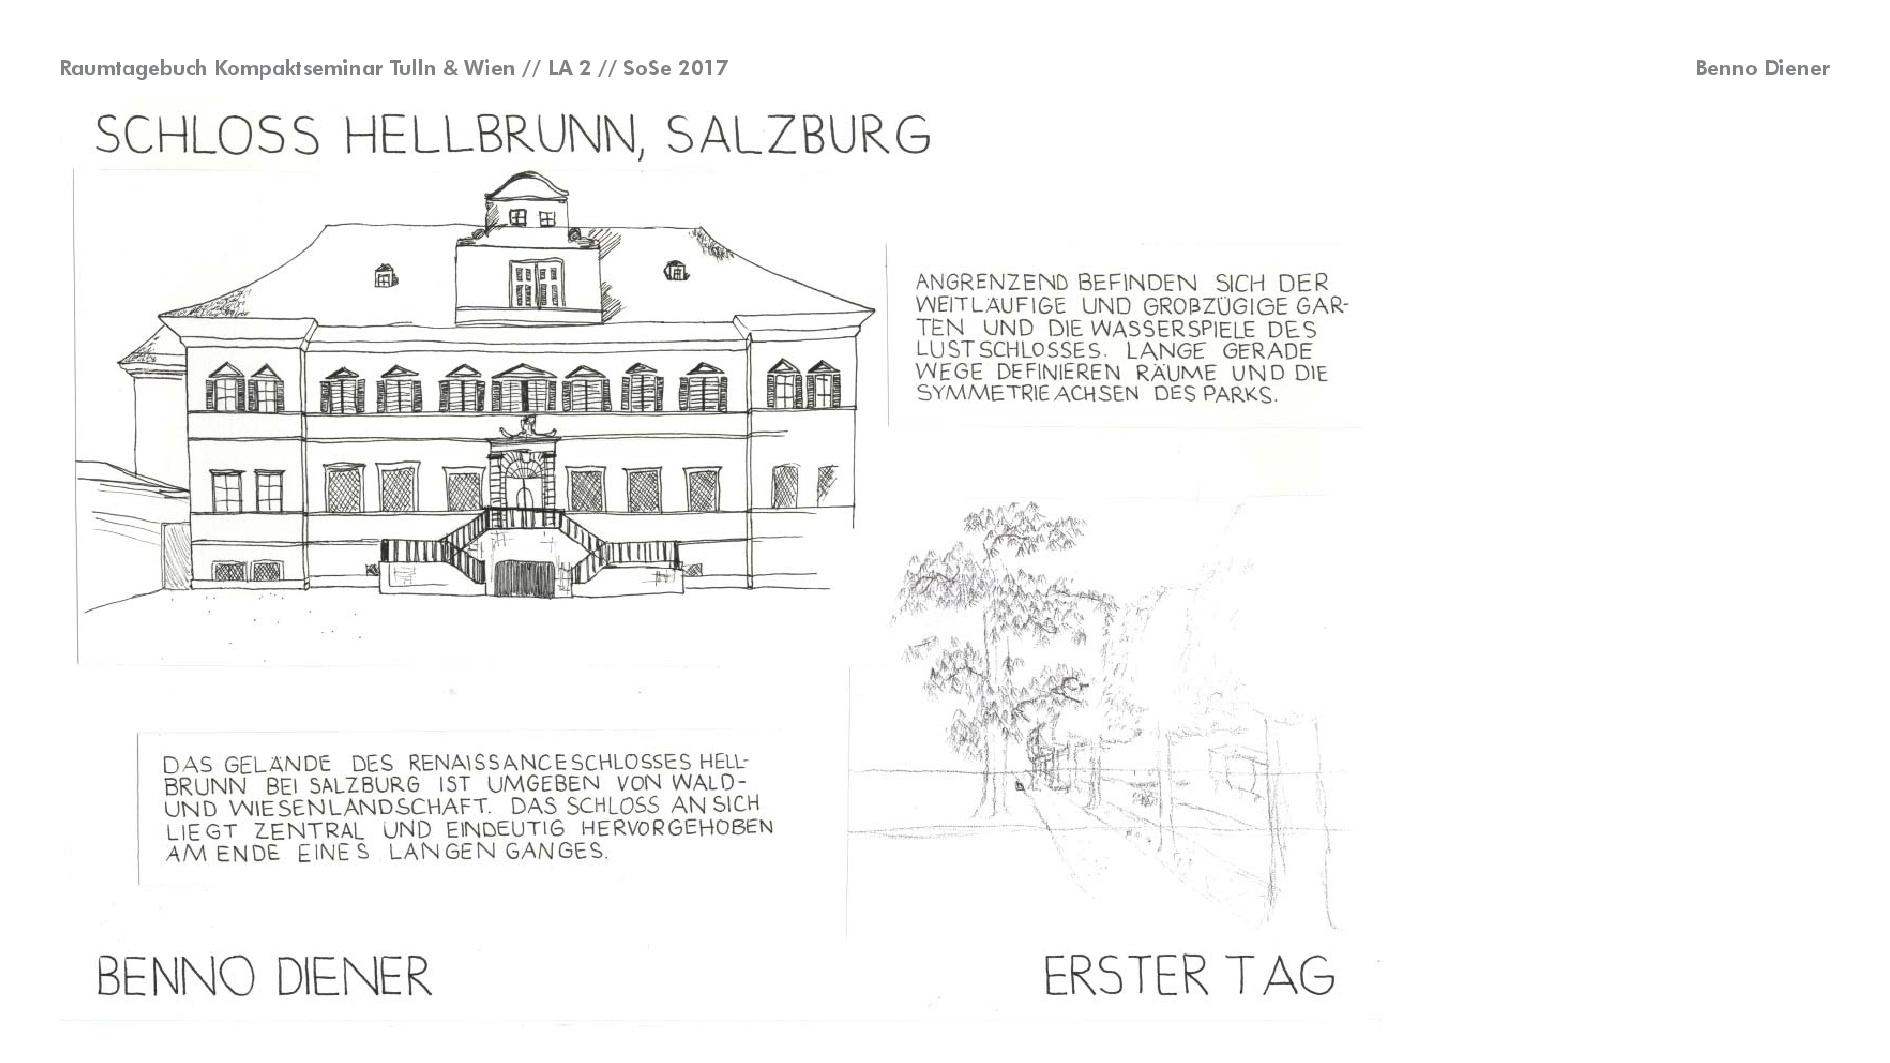 NEU Screen Raumtagebuch Tulln Wien SoSe 17 007